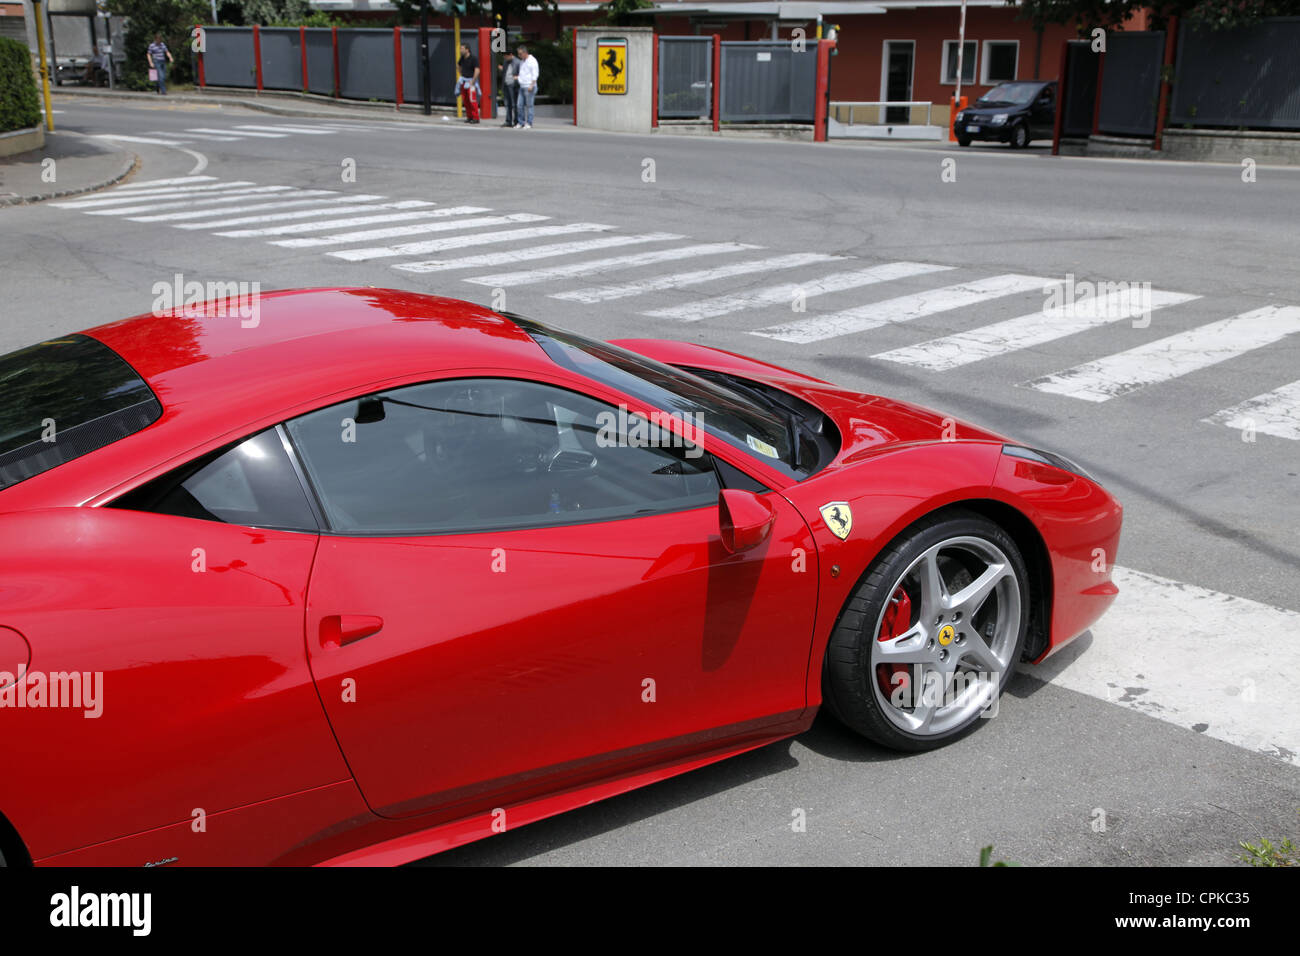 RED FERRARI 458 CAR & FACTORY GATES MARANELLO ITALY 08 May 2012 - Stock Image